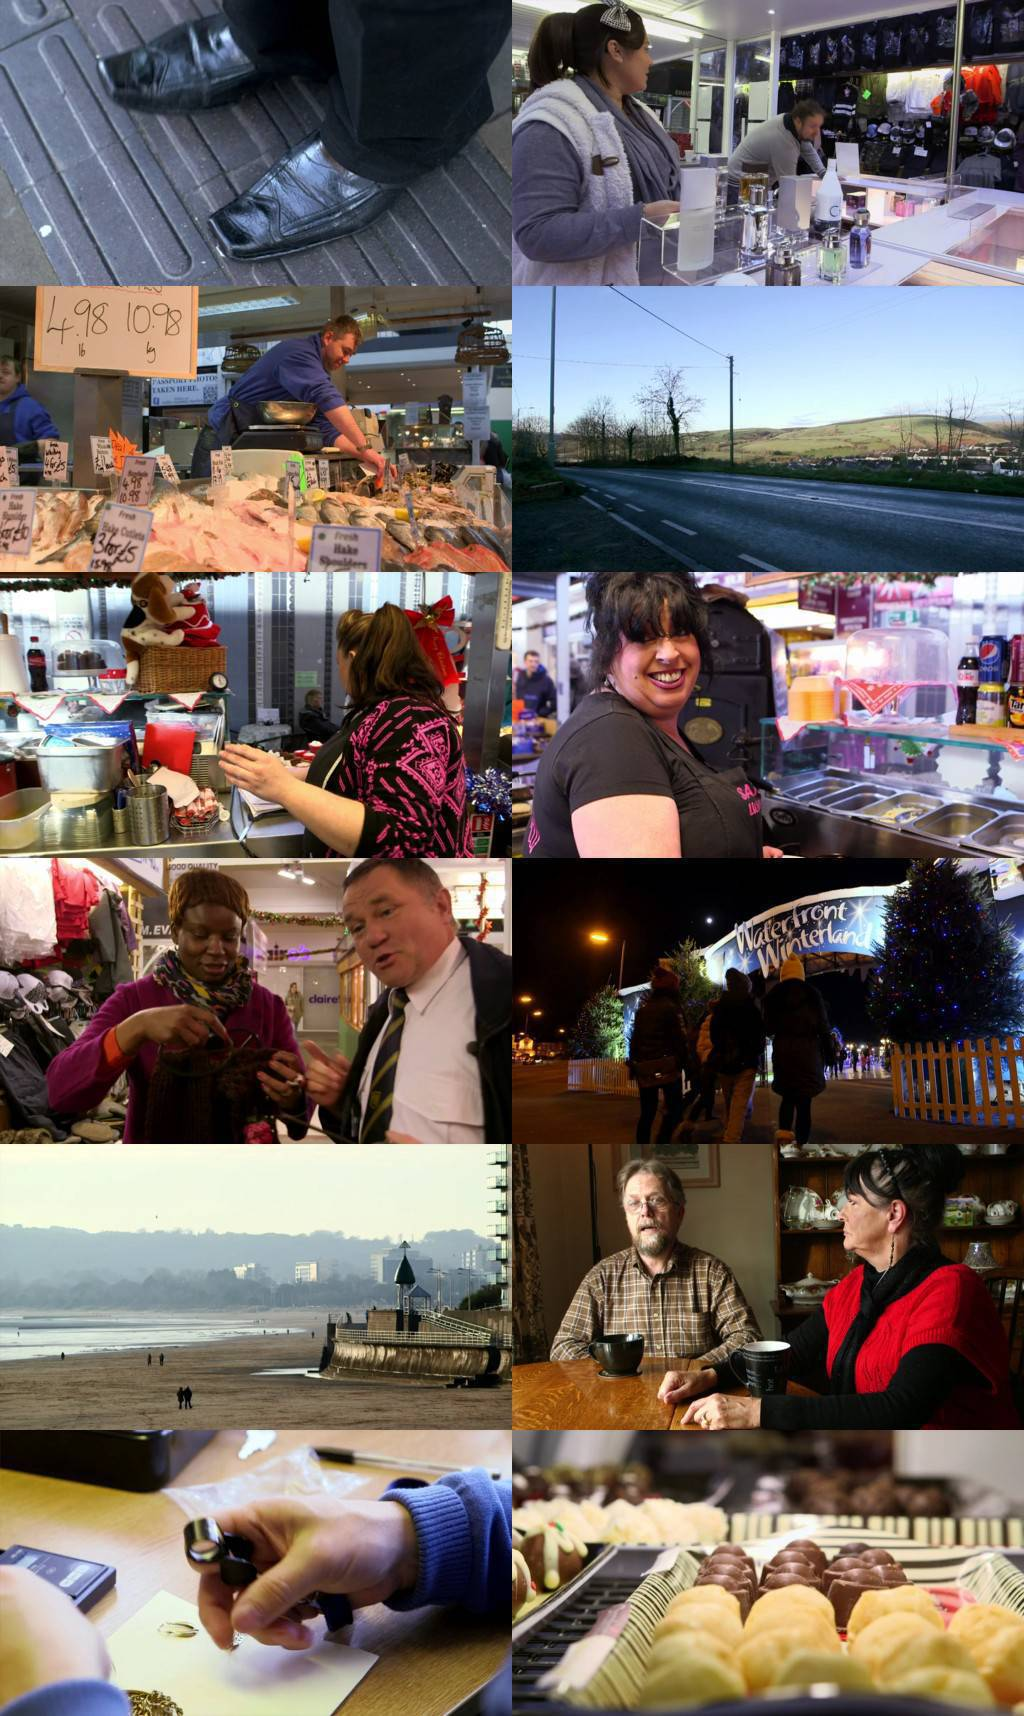 Swansea Market S01E02 HDTV x264-C4TV